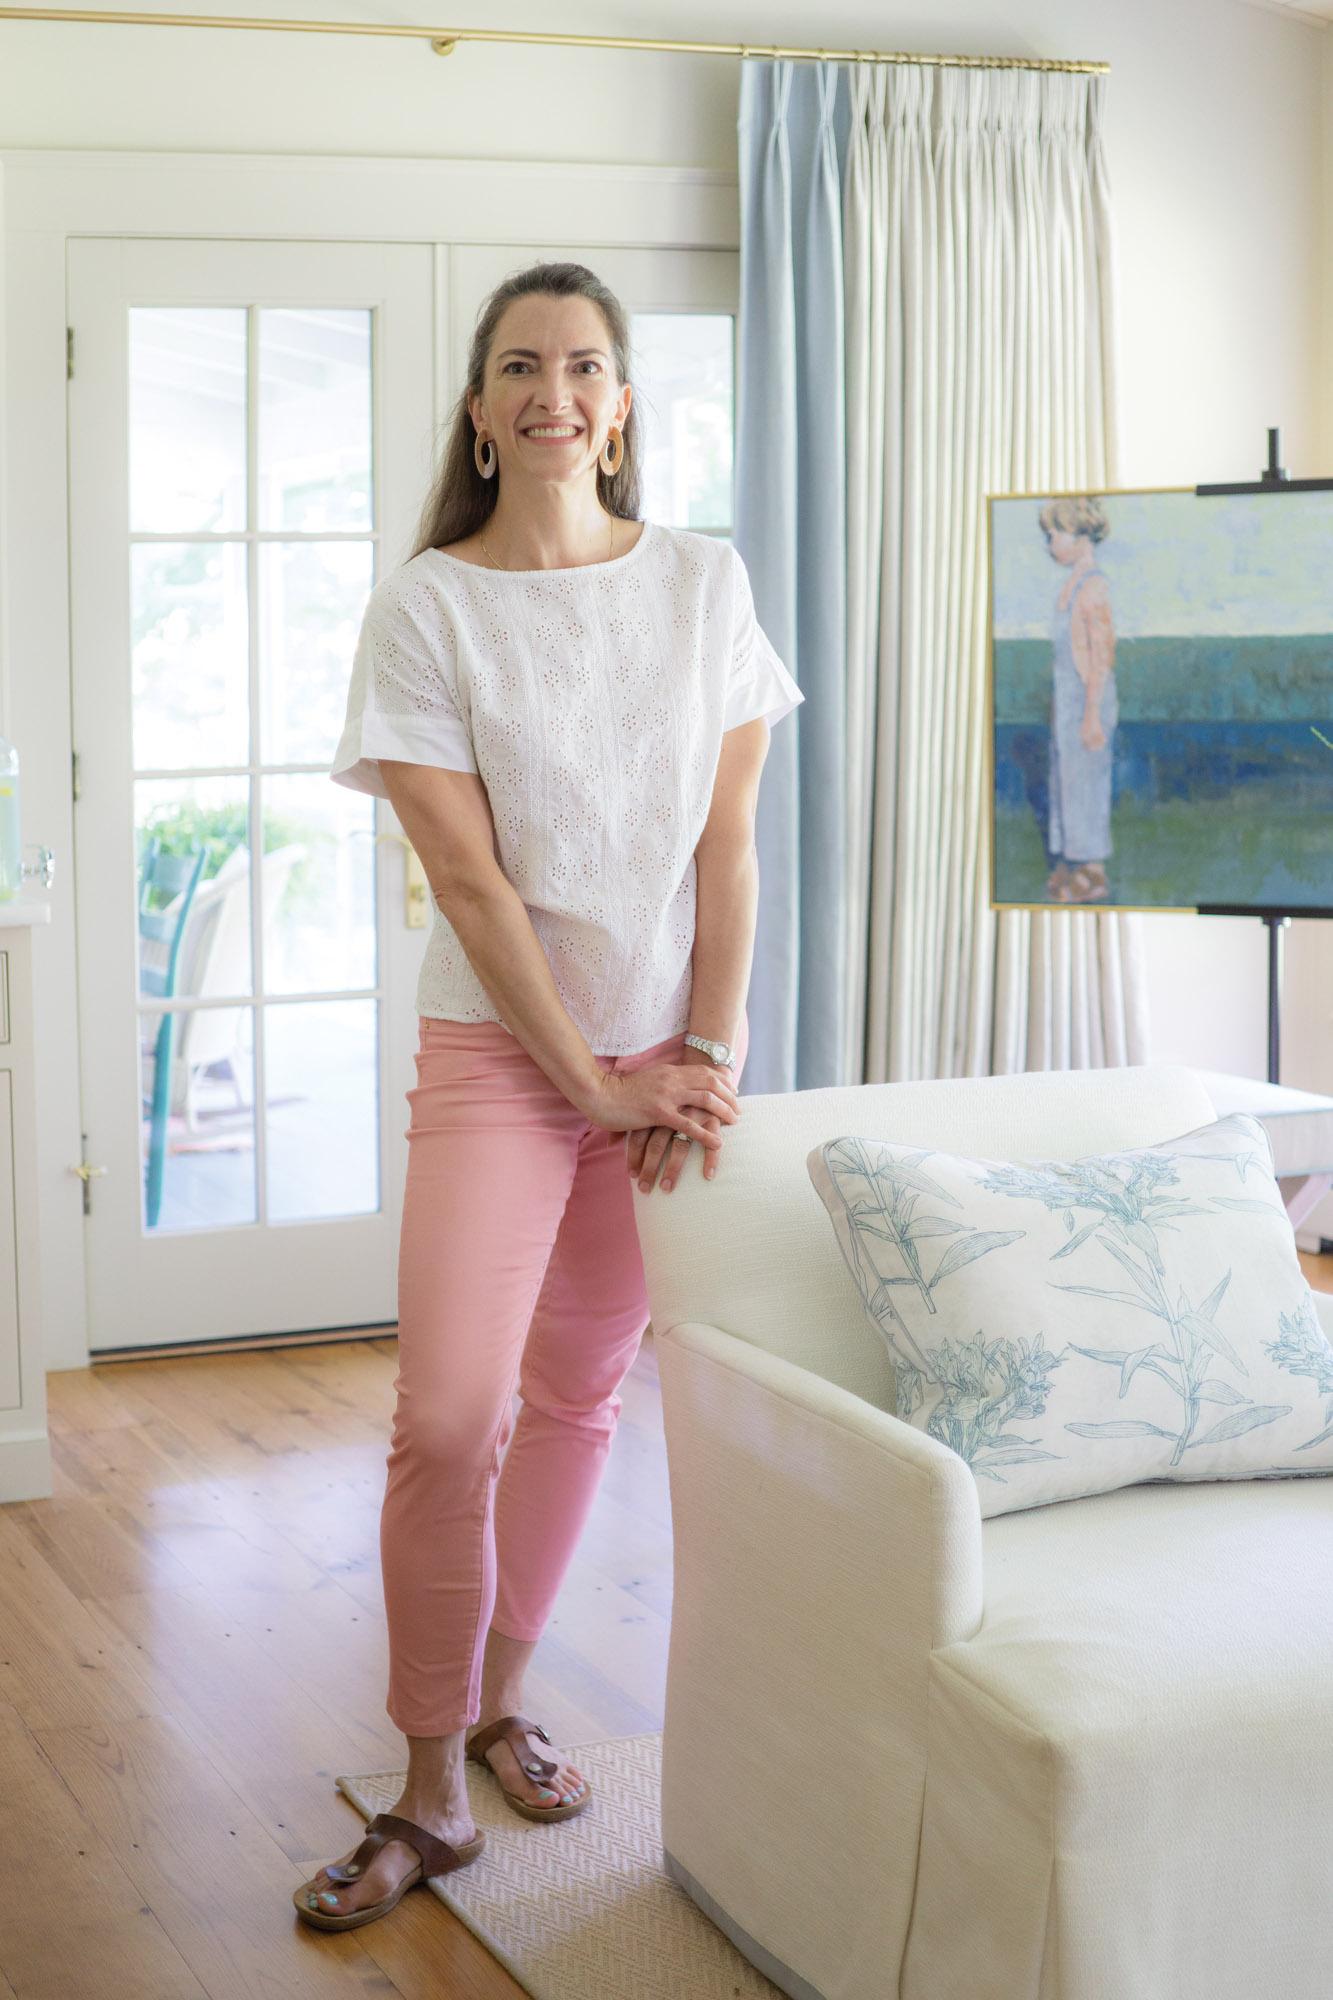 Amy Mitchell, Home Glow Design